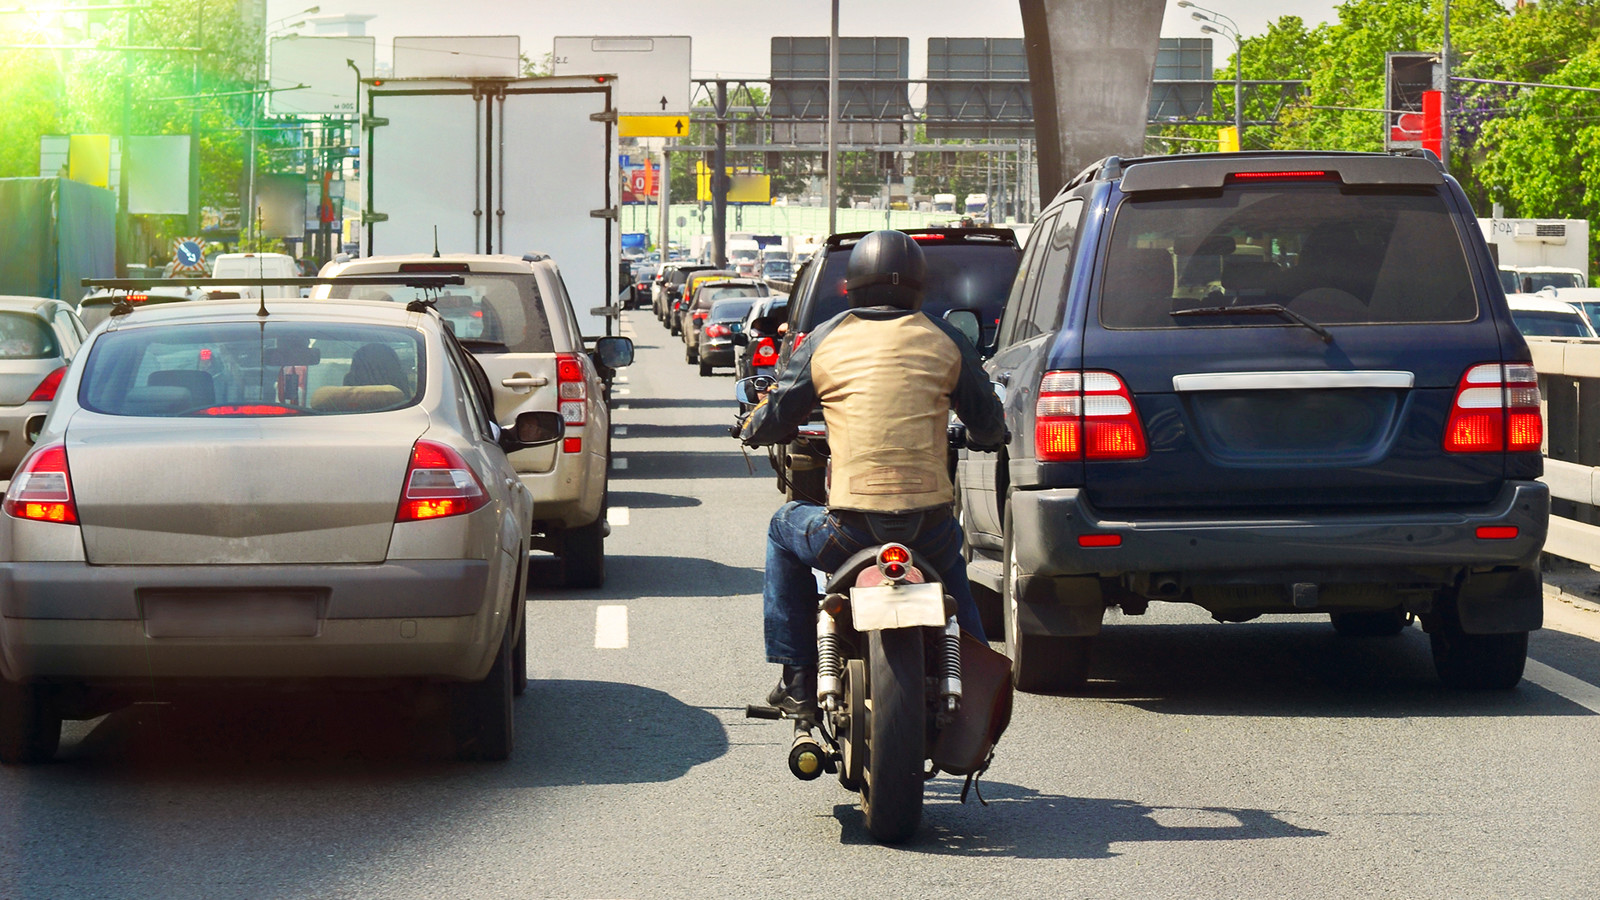 Мотоциклисты неполучат привилегий надороге— МВД